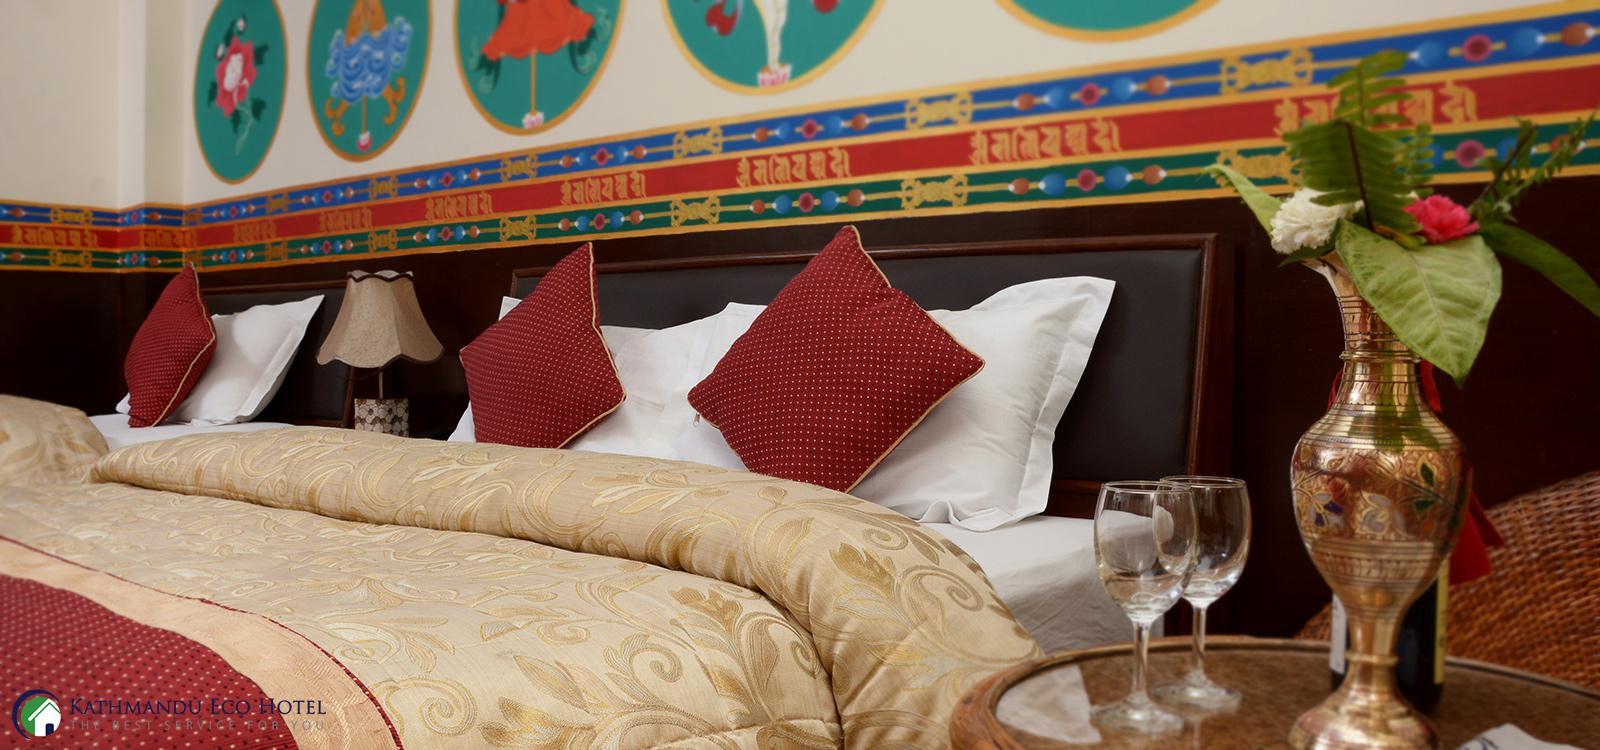 Eco Suite Room Kathmandu Eco Hotel